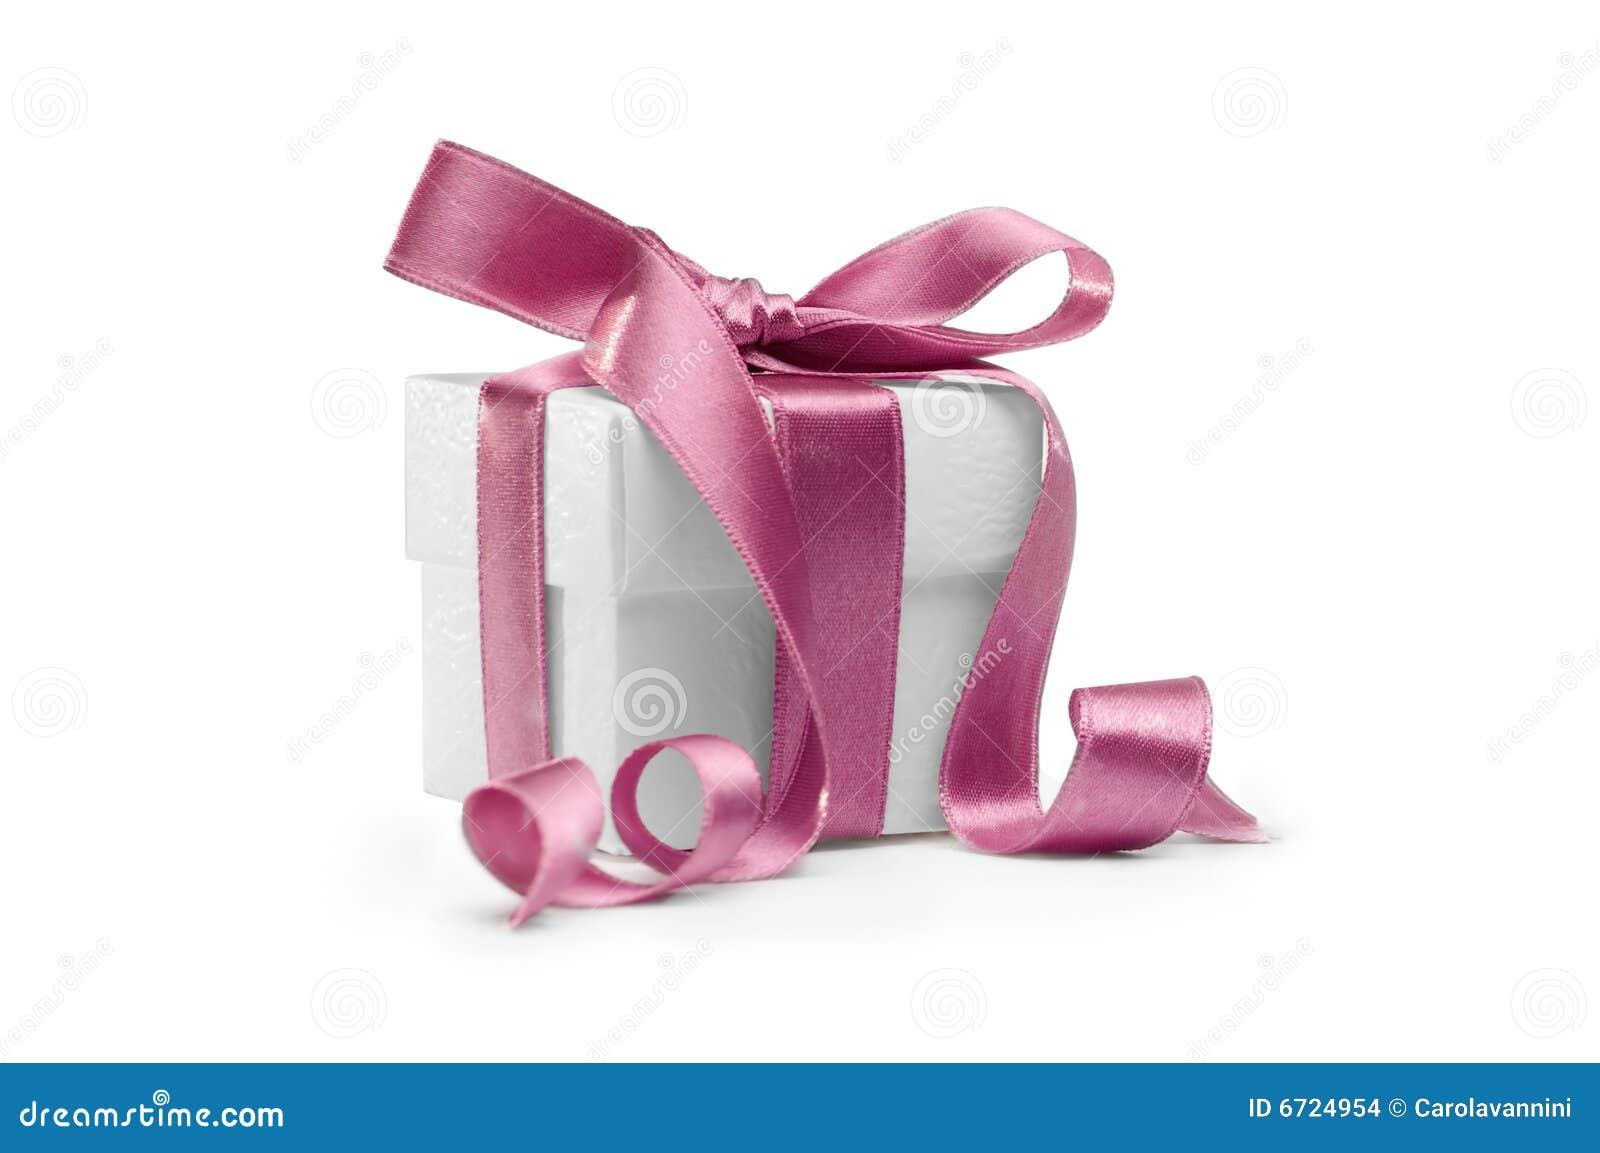 Anwesender Kasten mit rosafarbenem Farbband